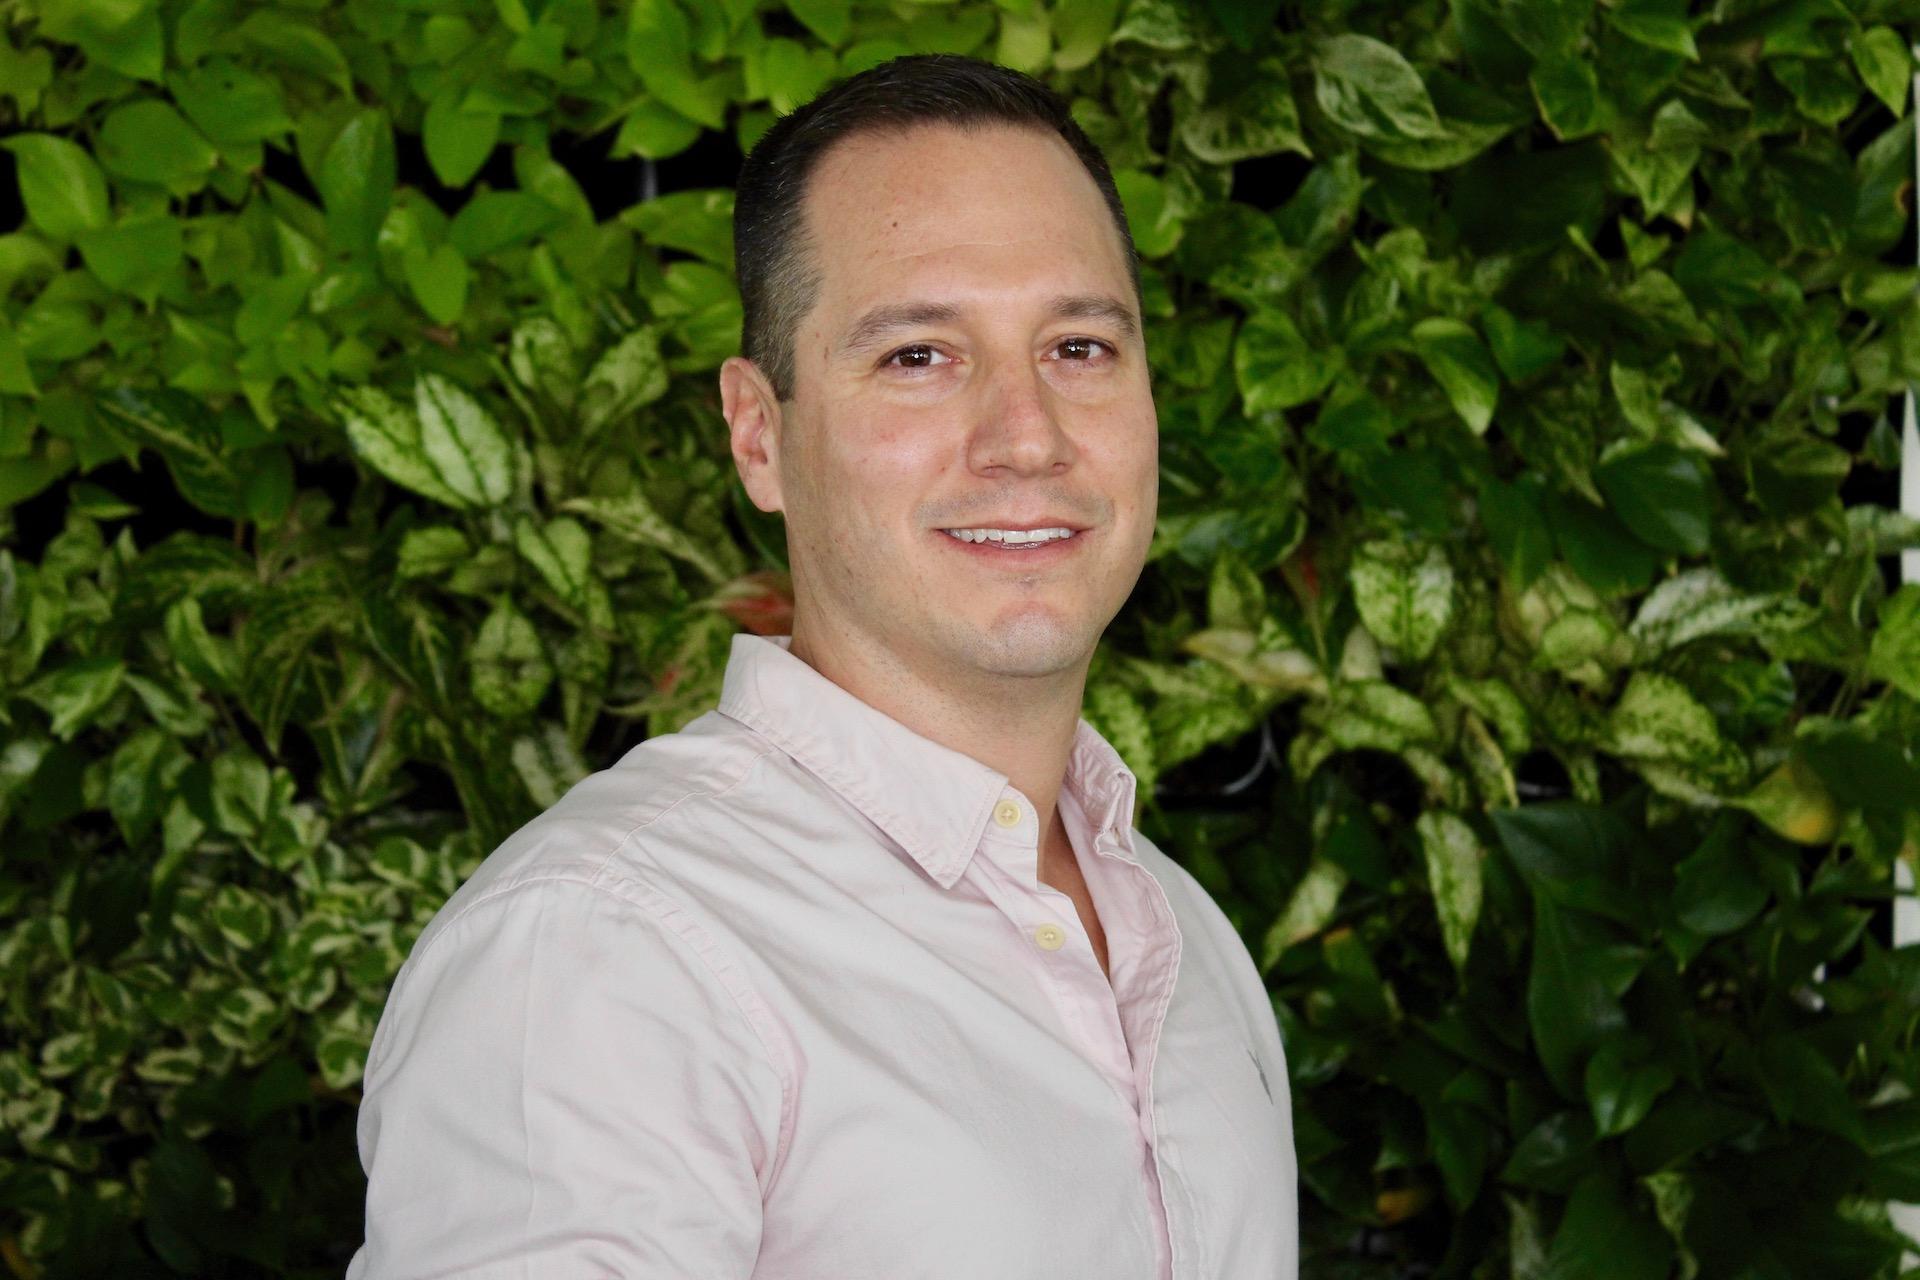 Antonio Gonzales